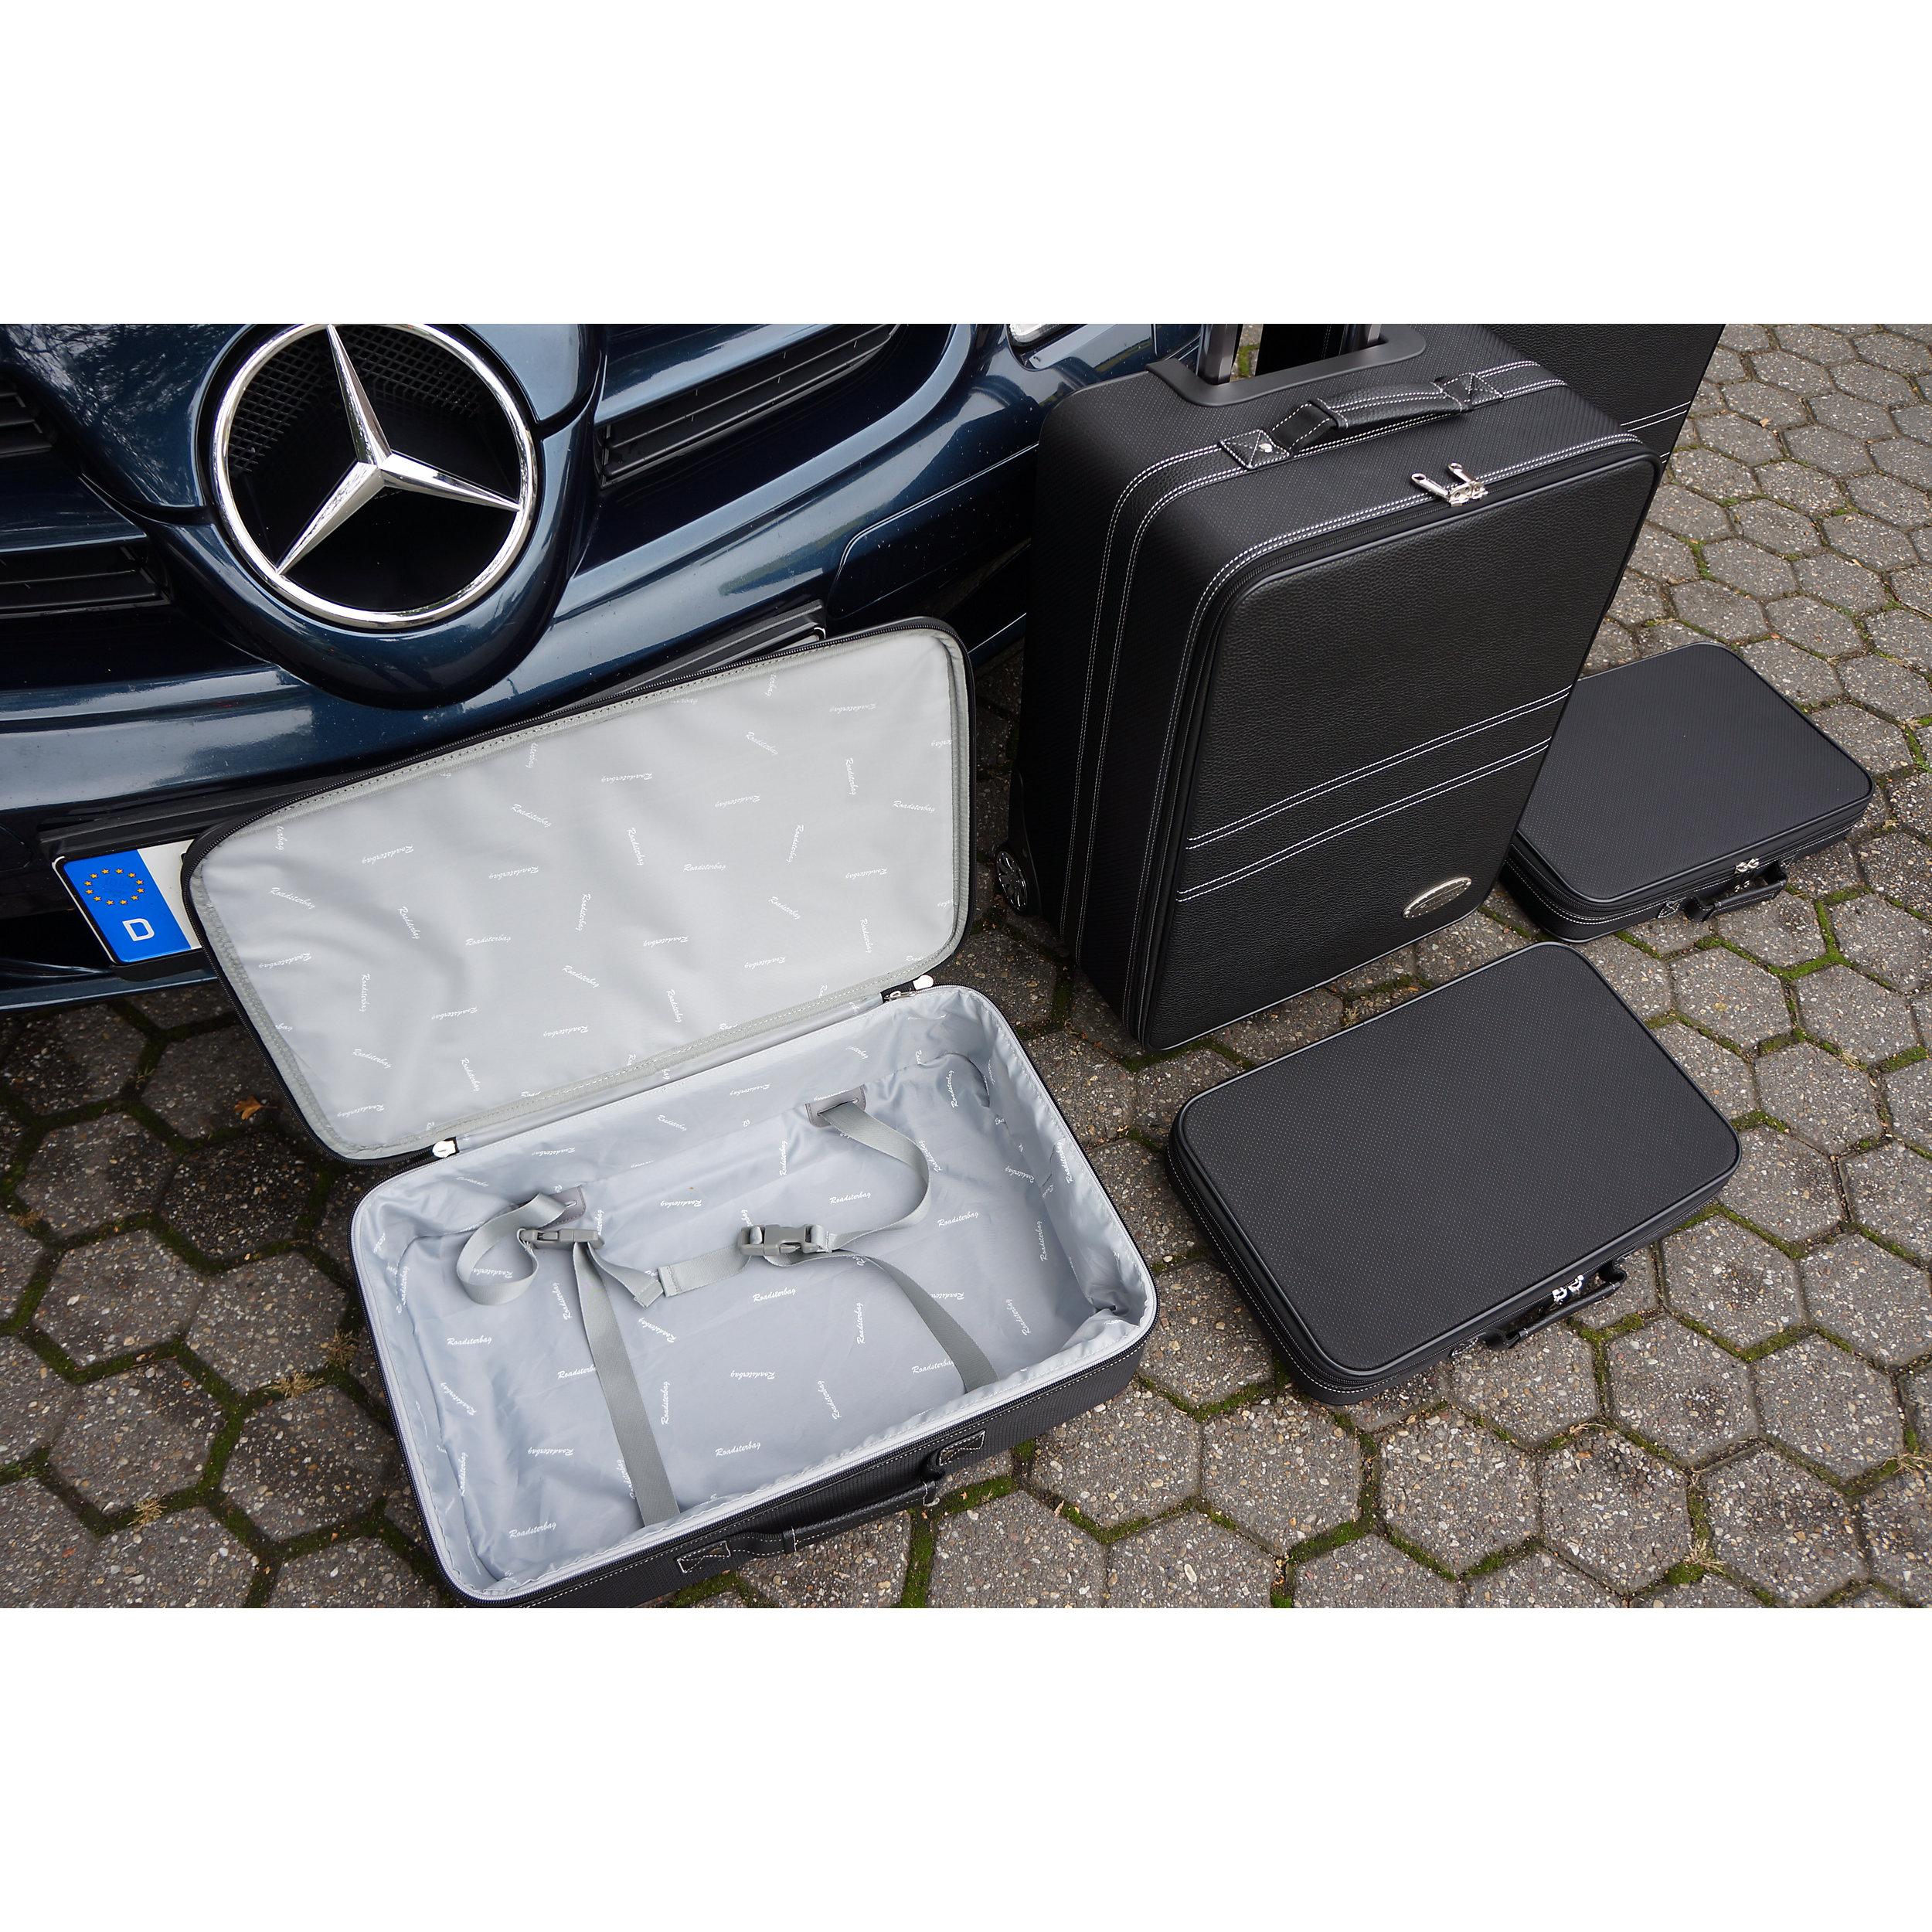 5-tlg. Kofferset mit 2 Rollen Mercedes SLK (R171) 148 Liter